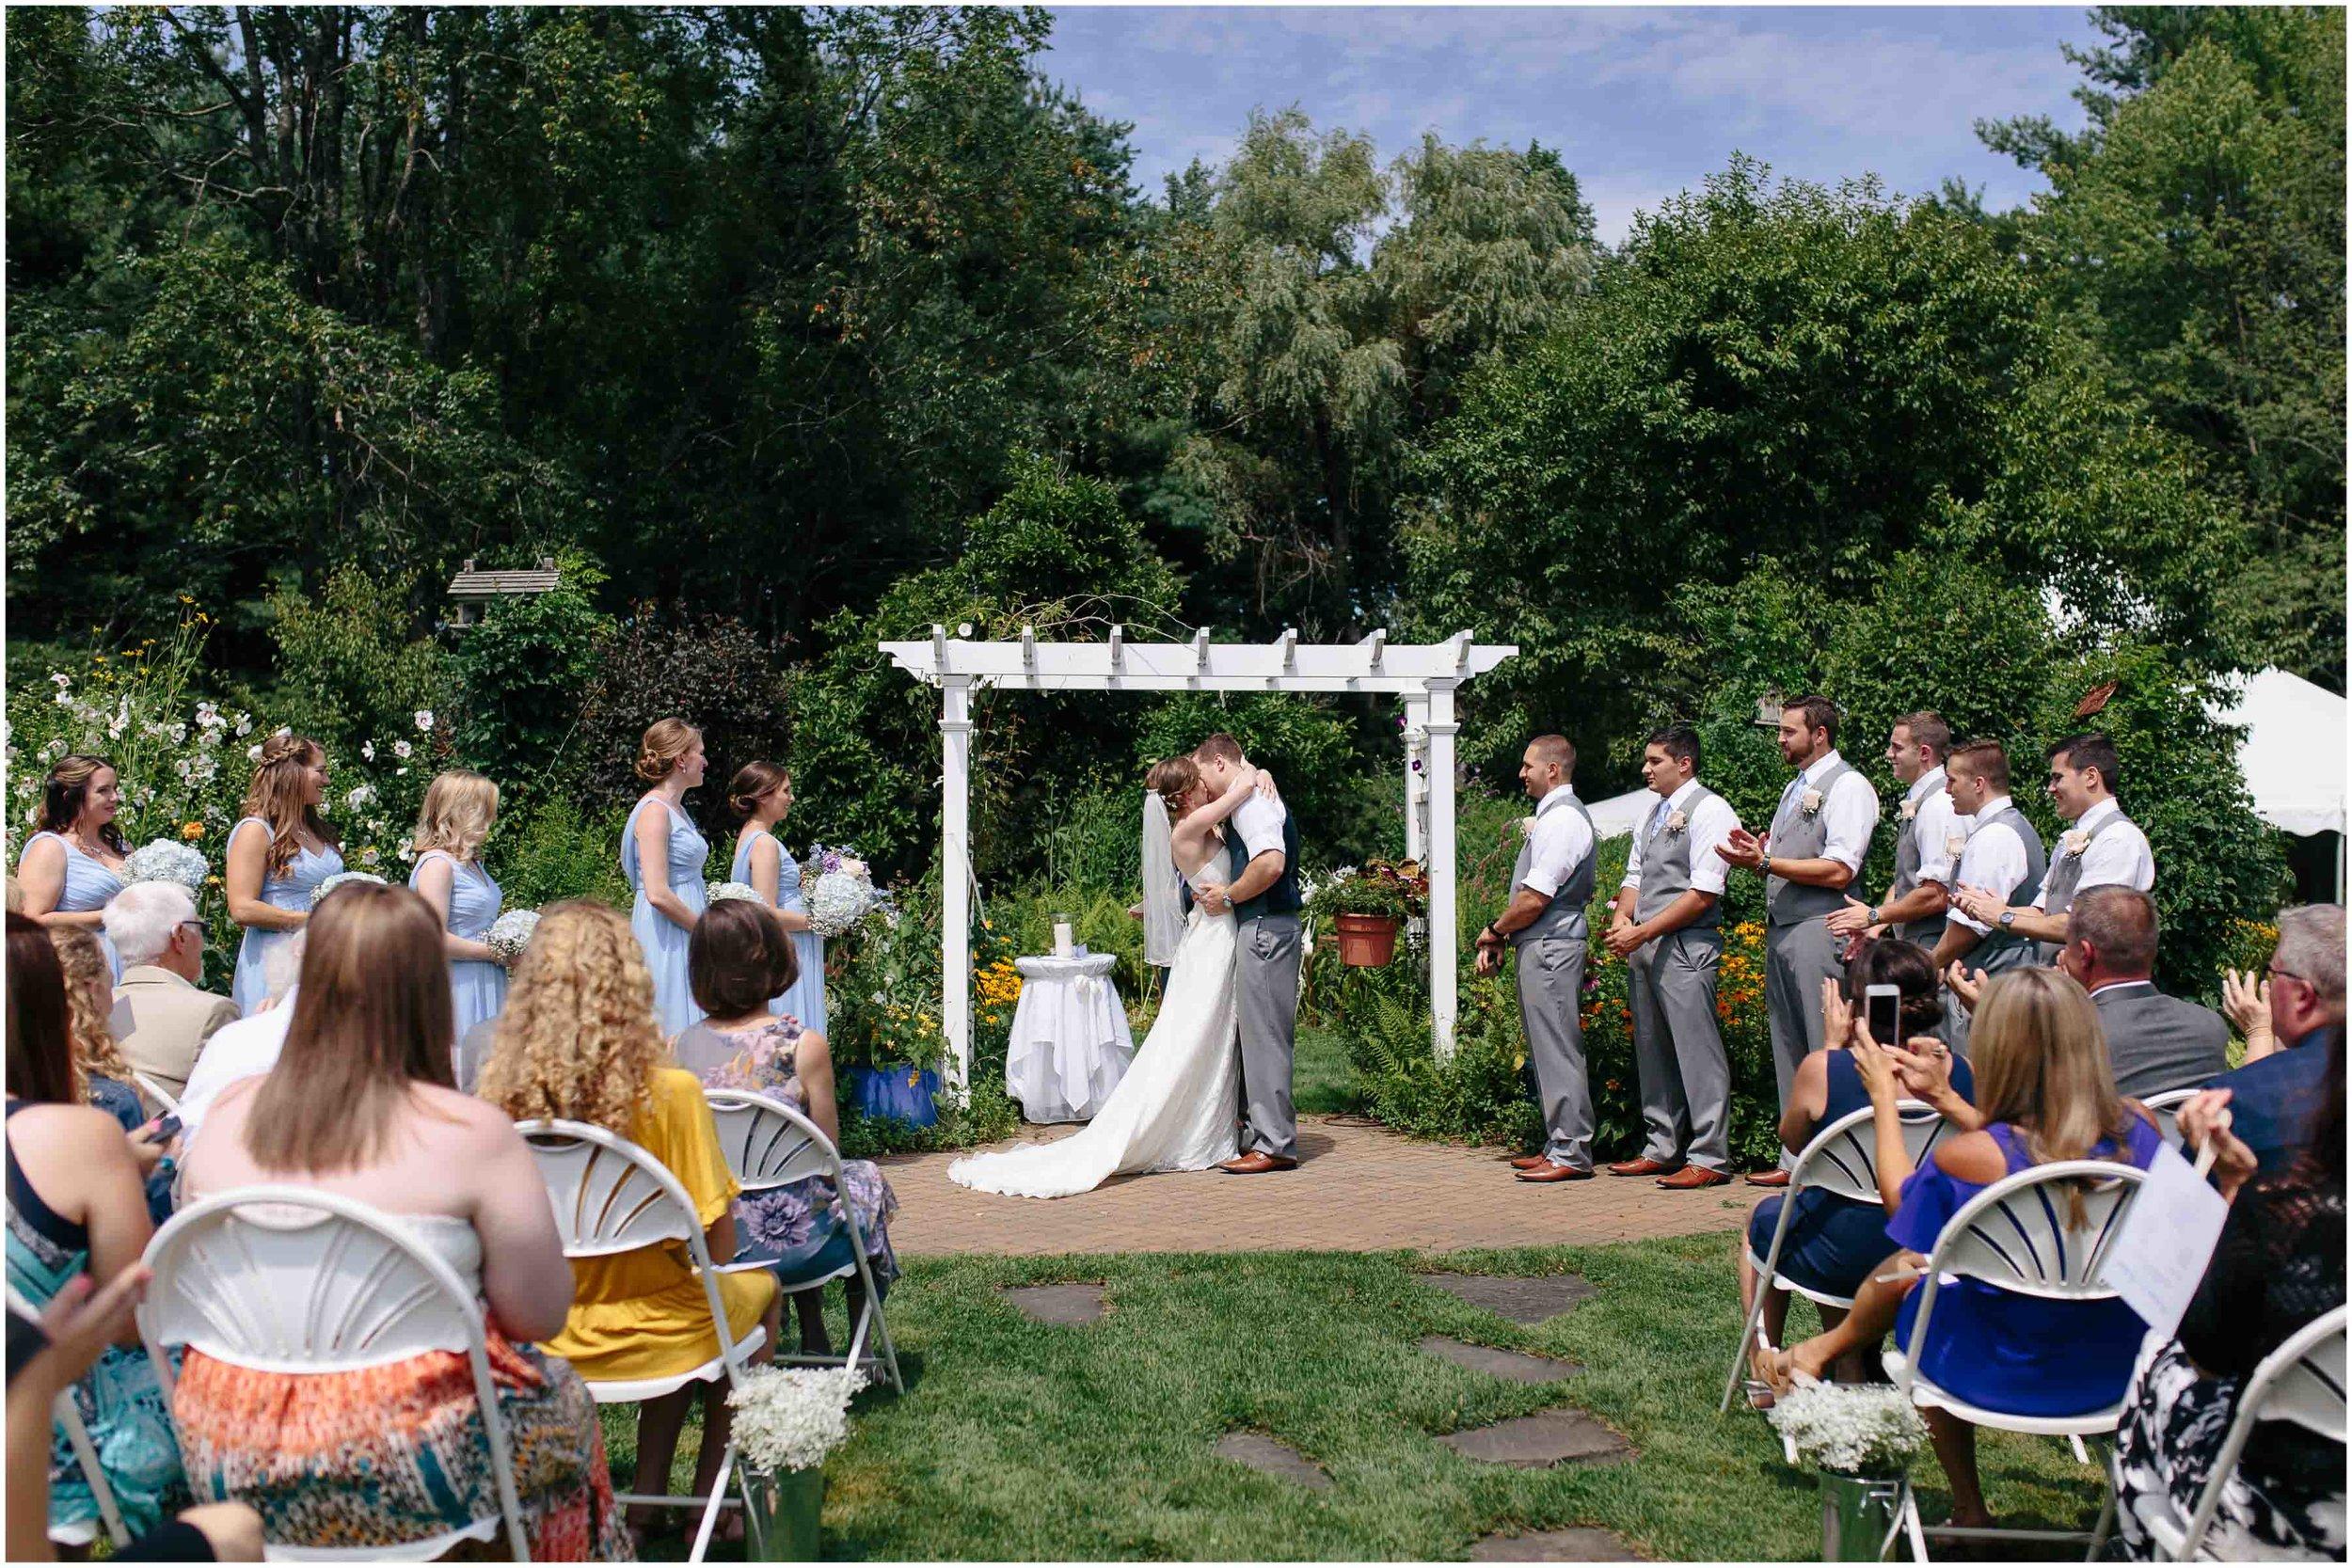 Sunny New Hampshire Summer Wedding at Mile Away Restaurant Milford - kiss